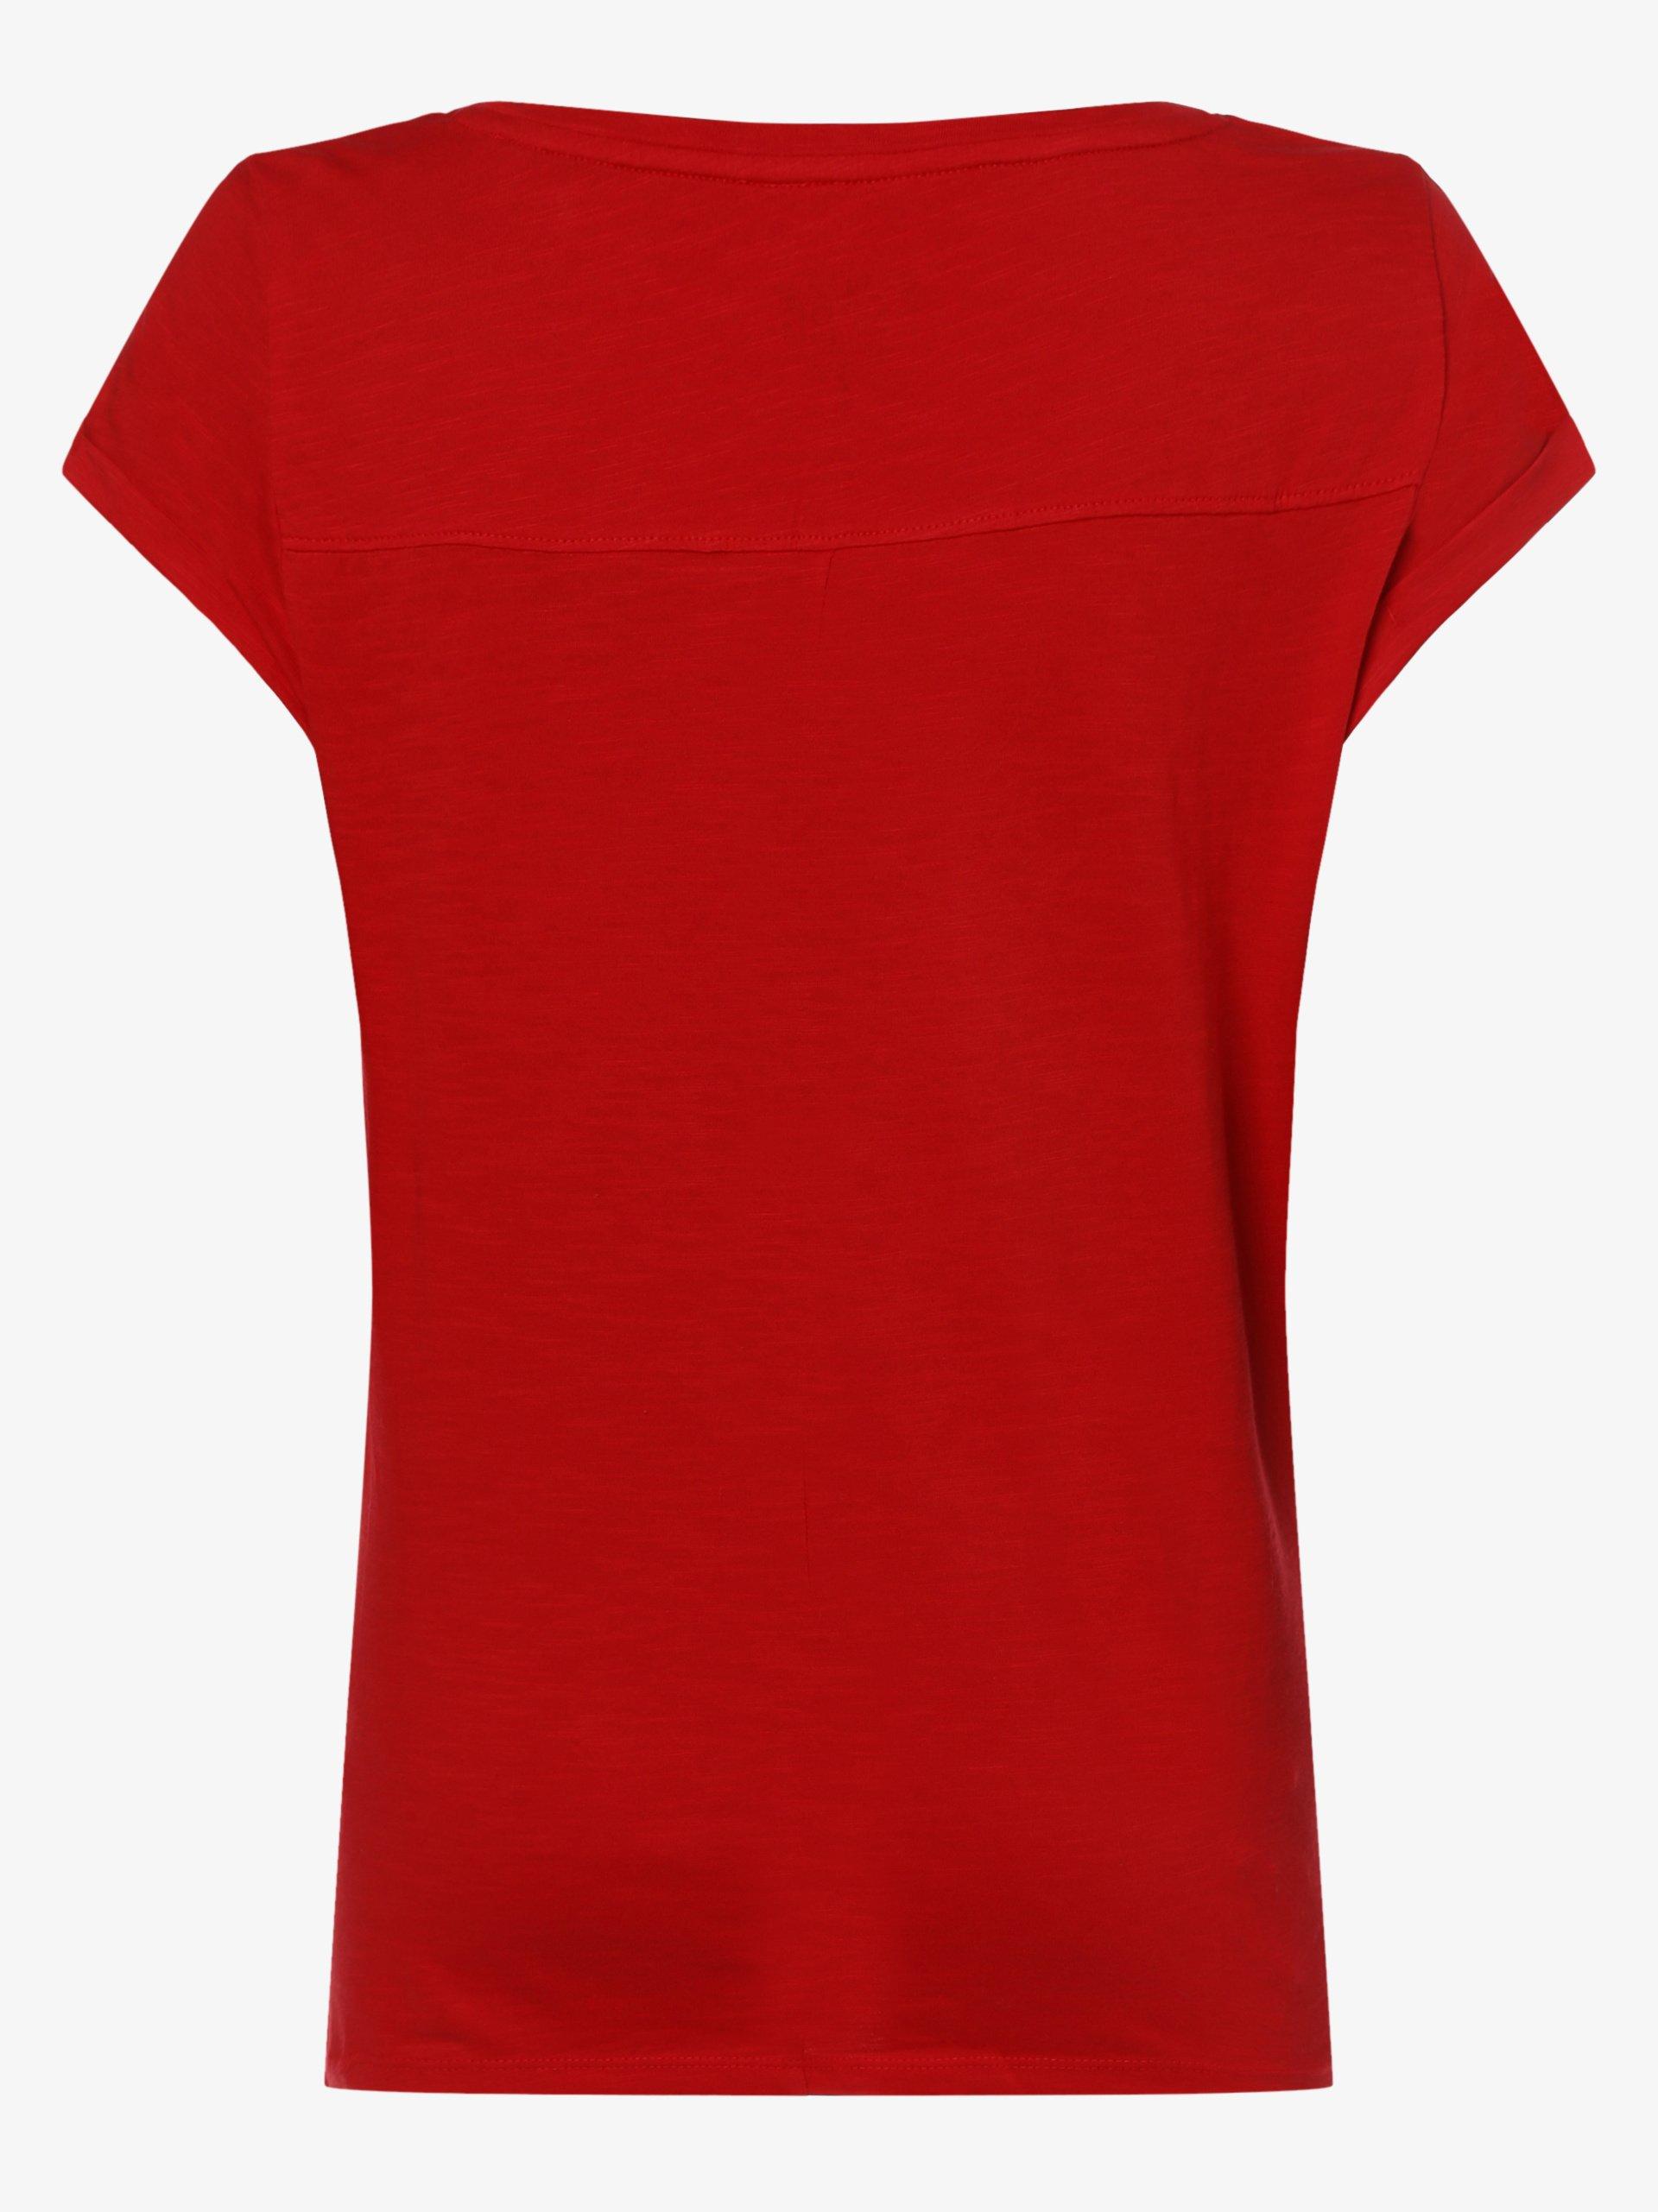 Esprit Casual Damen T-Shirt